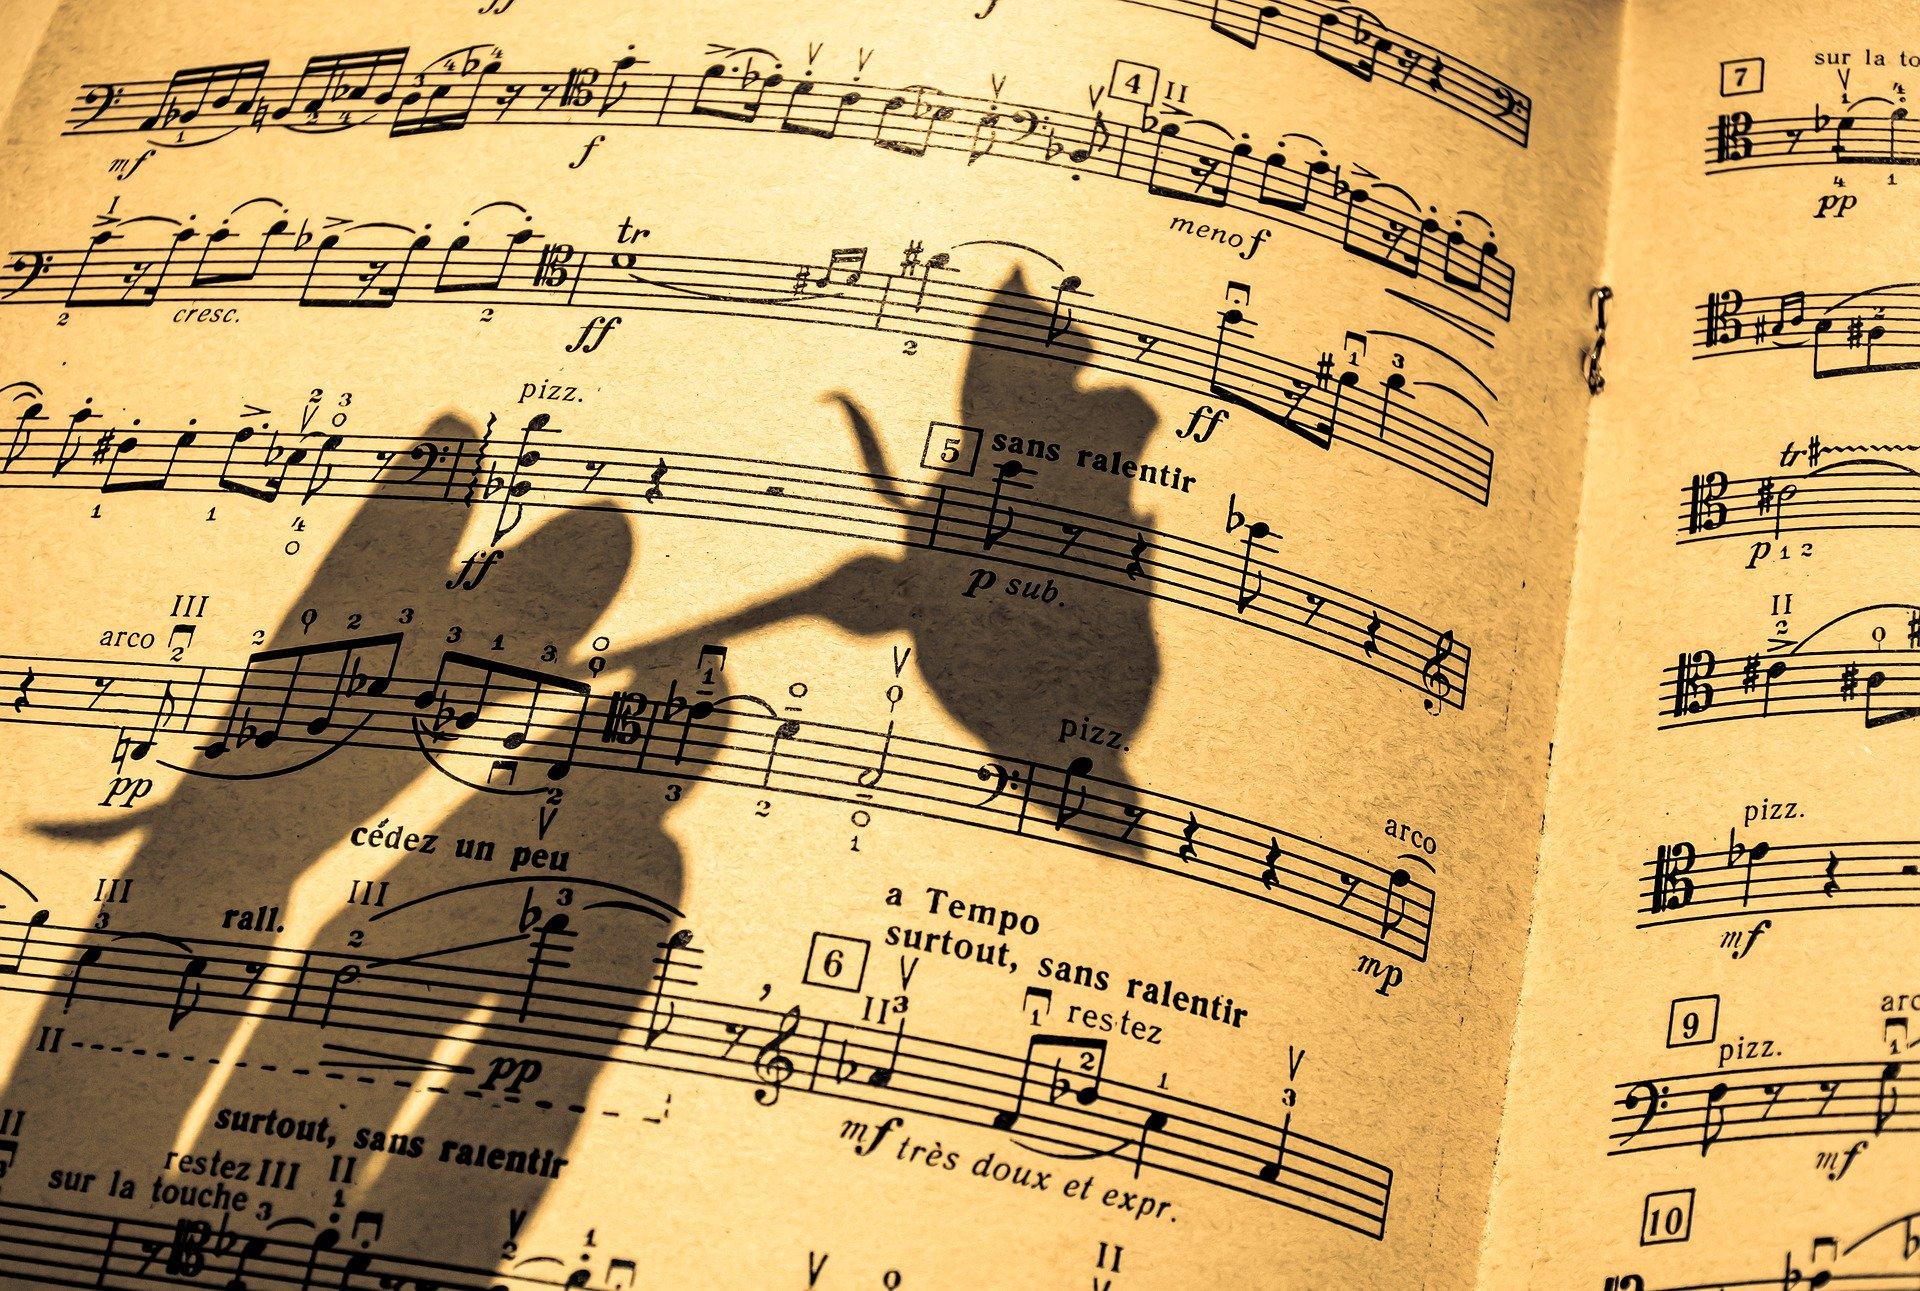 music sheets 1920x1291 - Free image bank